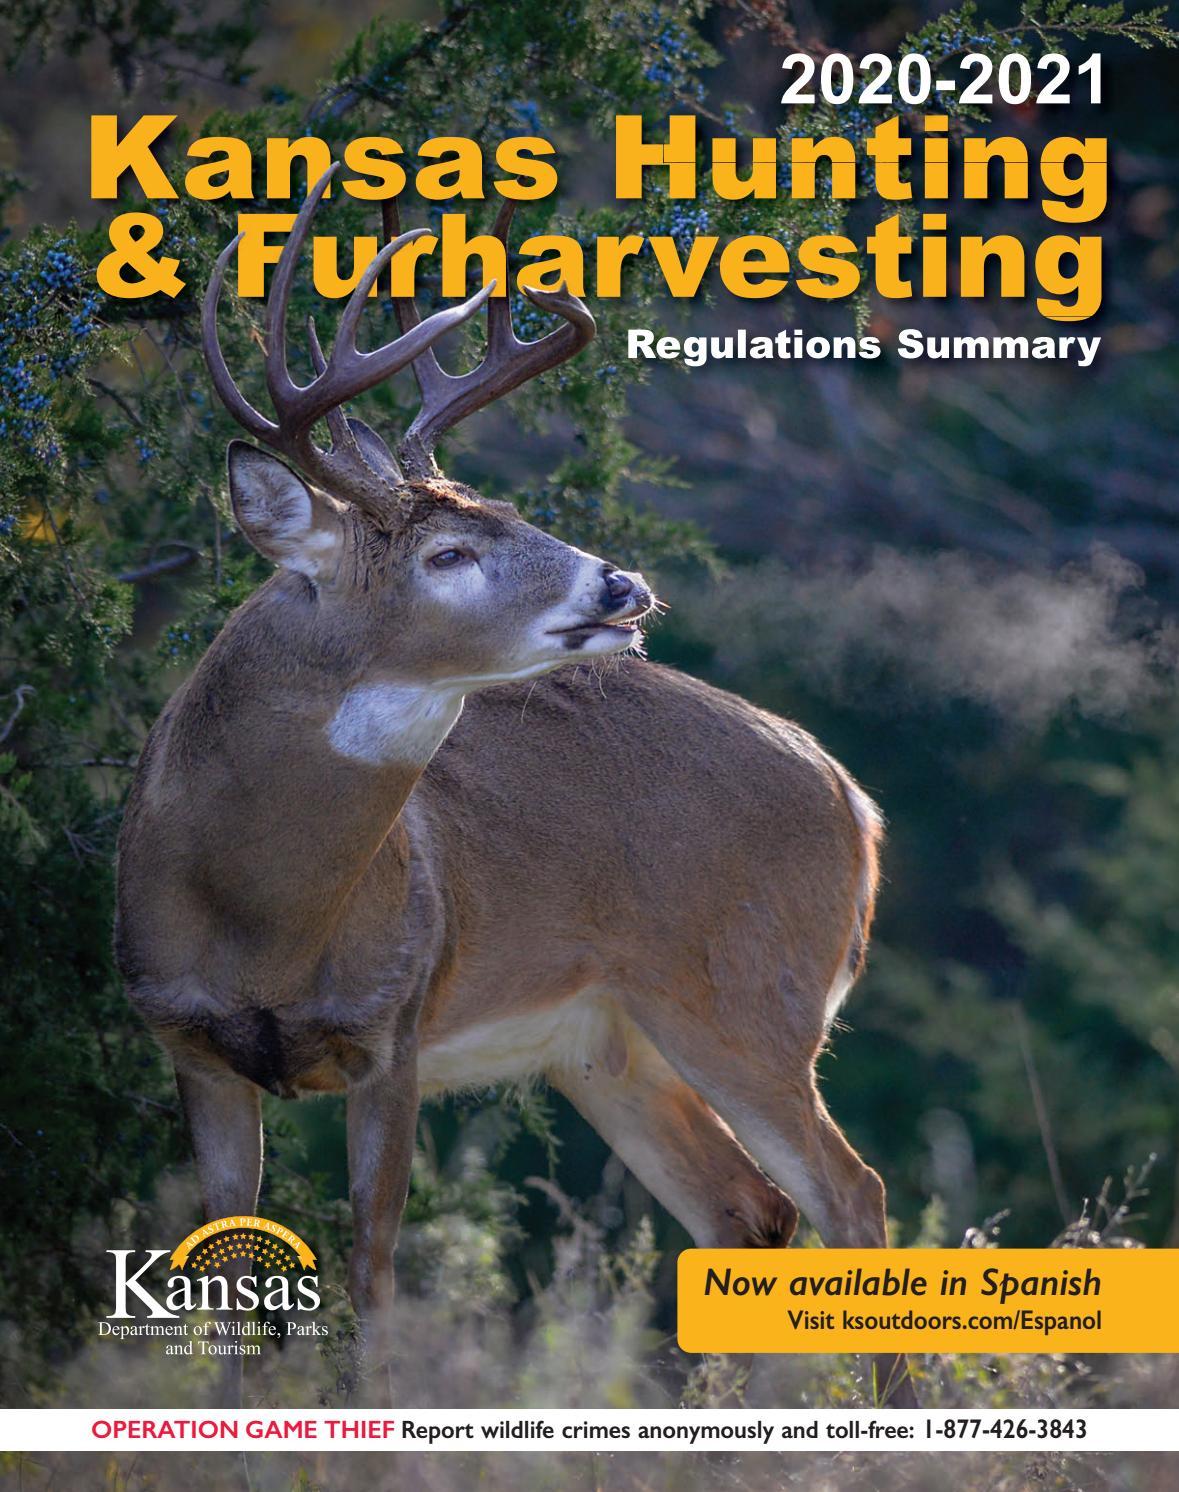 2020-2021 Kansas Hunting & Furharvesting Regulations Summary inside Pa Deer Season 2021